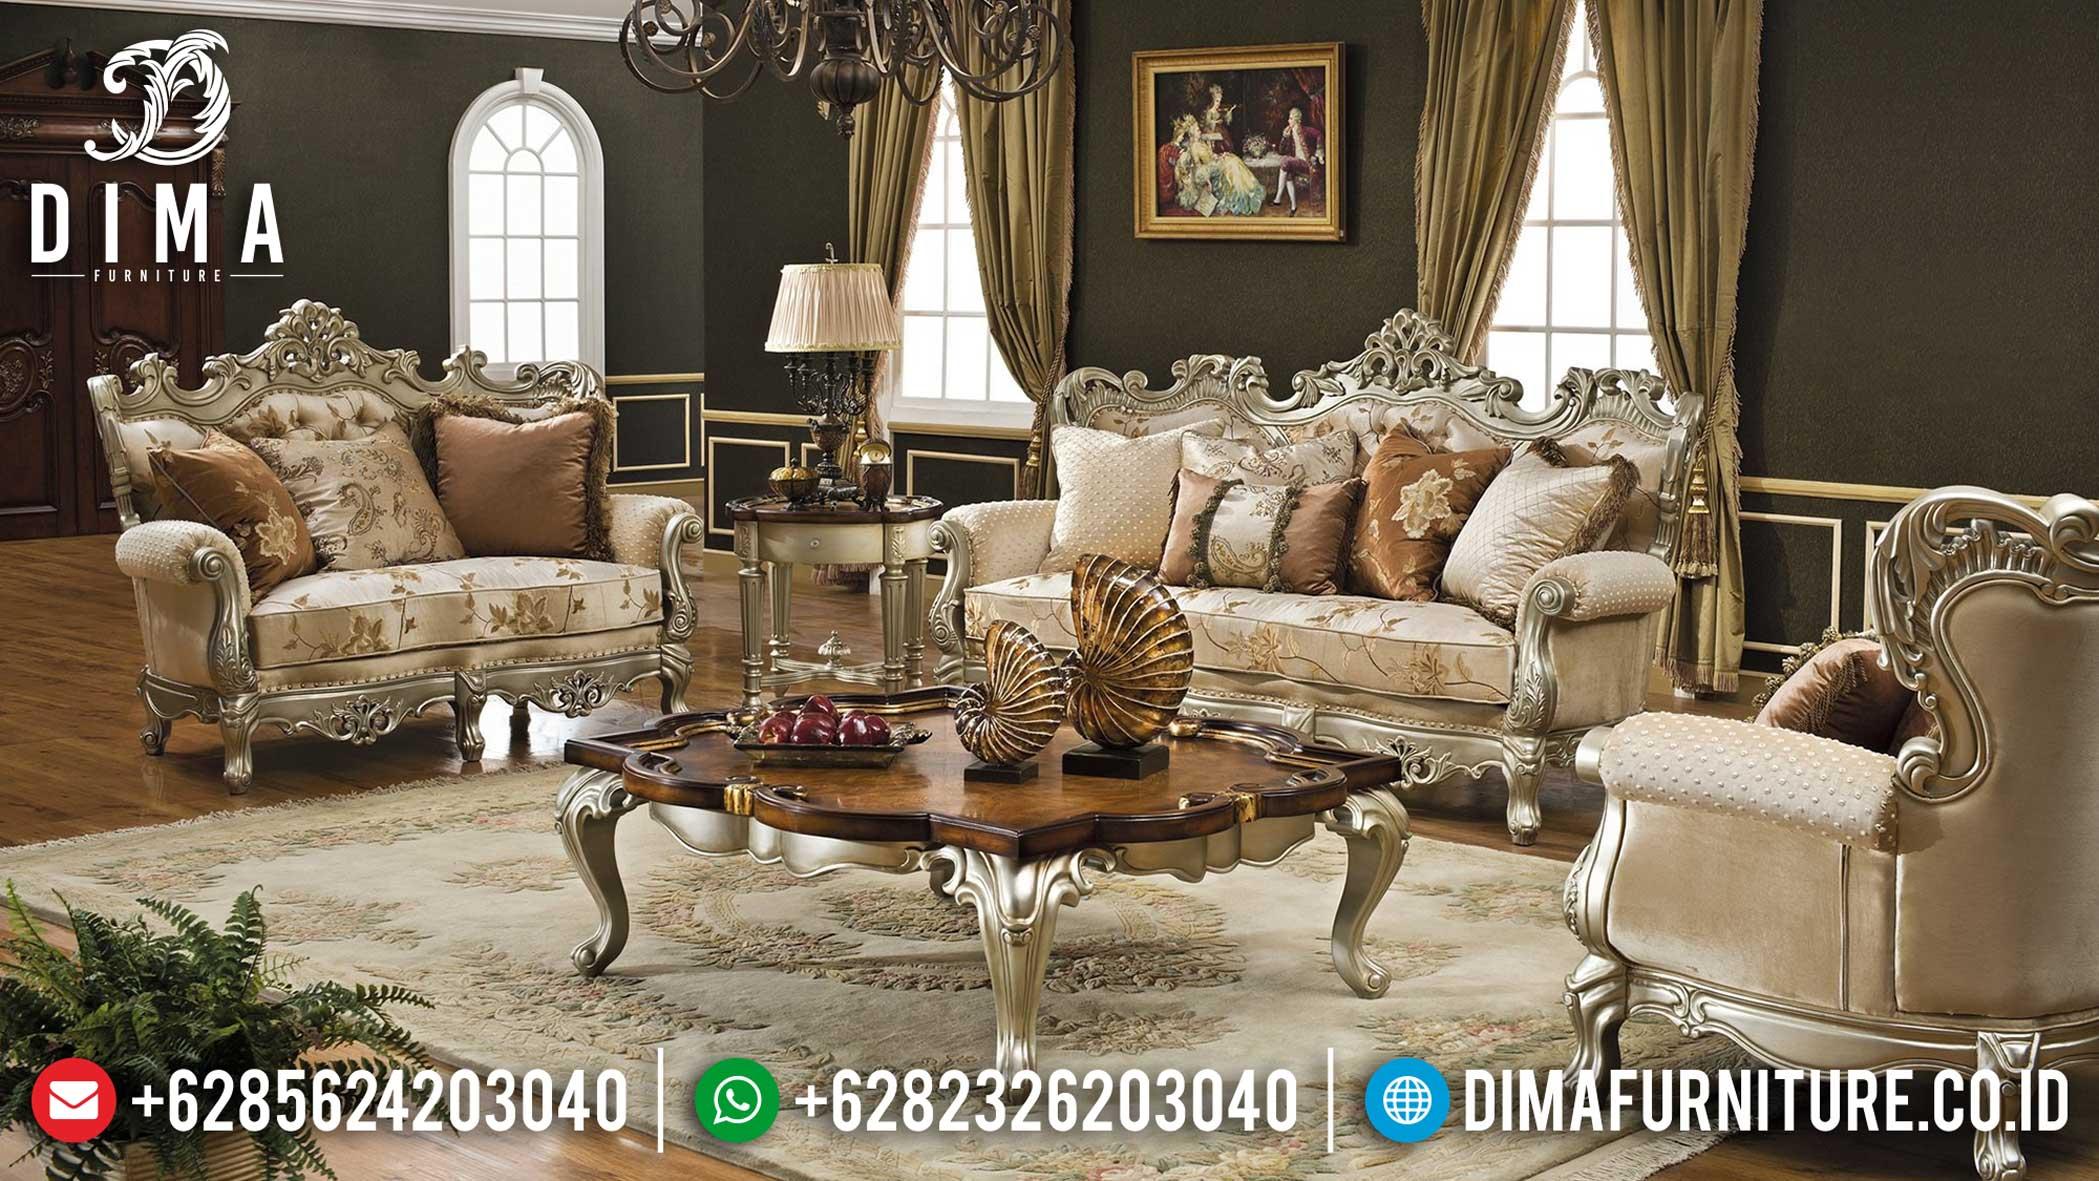 Harga Sofa Tamu Mewah Jepara Luxury Style Grade A Solid Wood Mahogani TTJ-1251